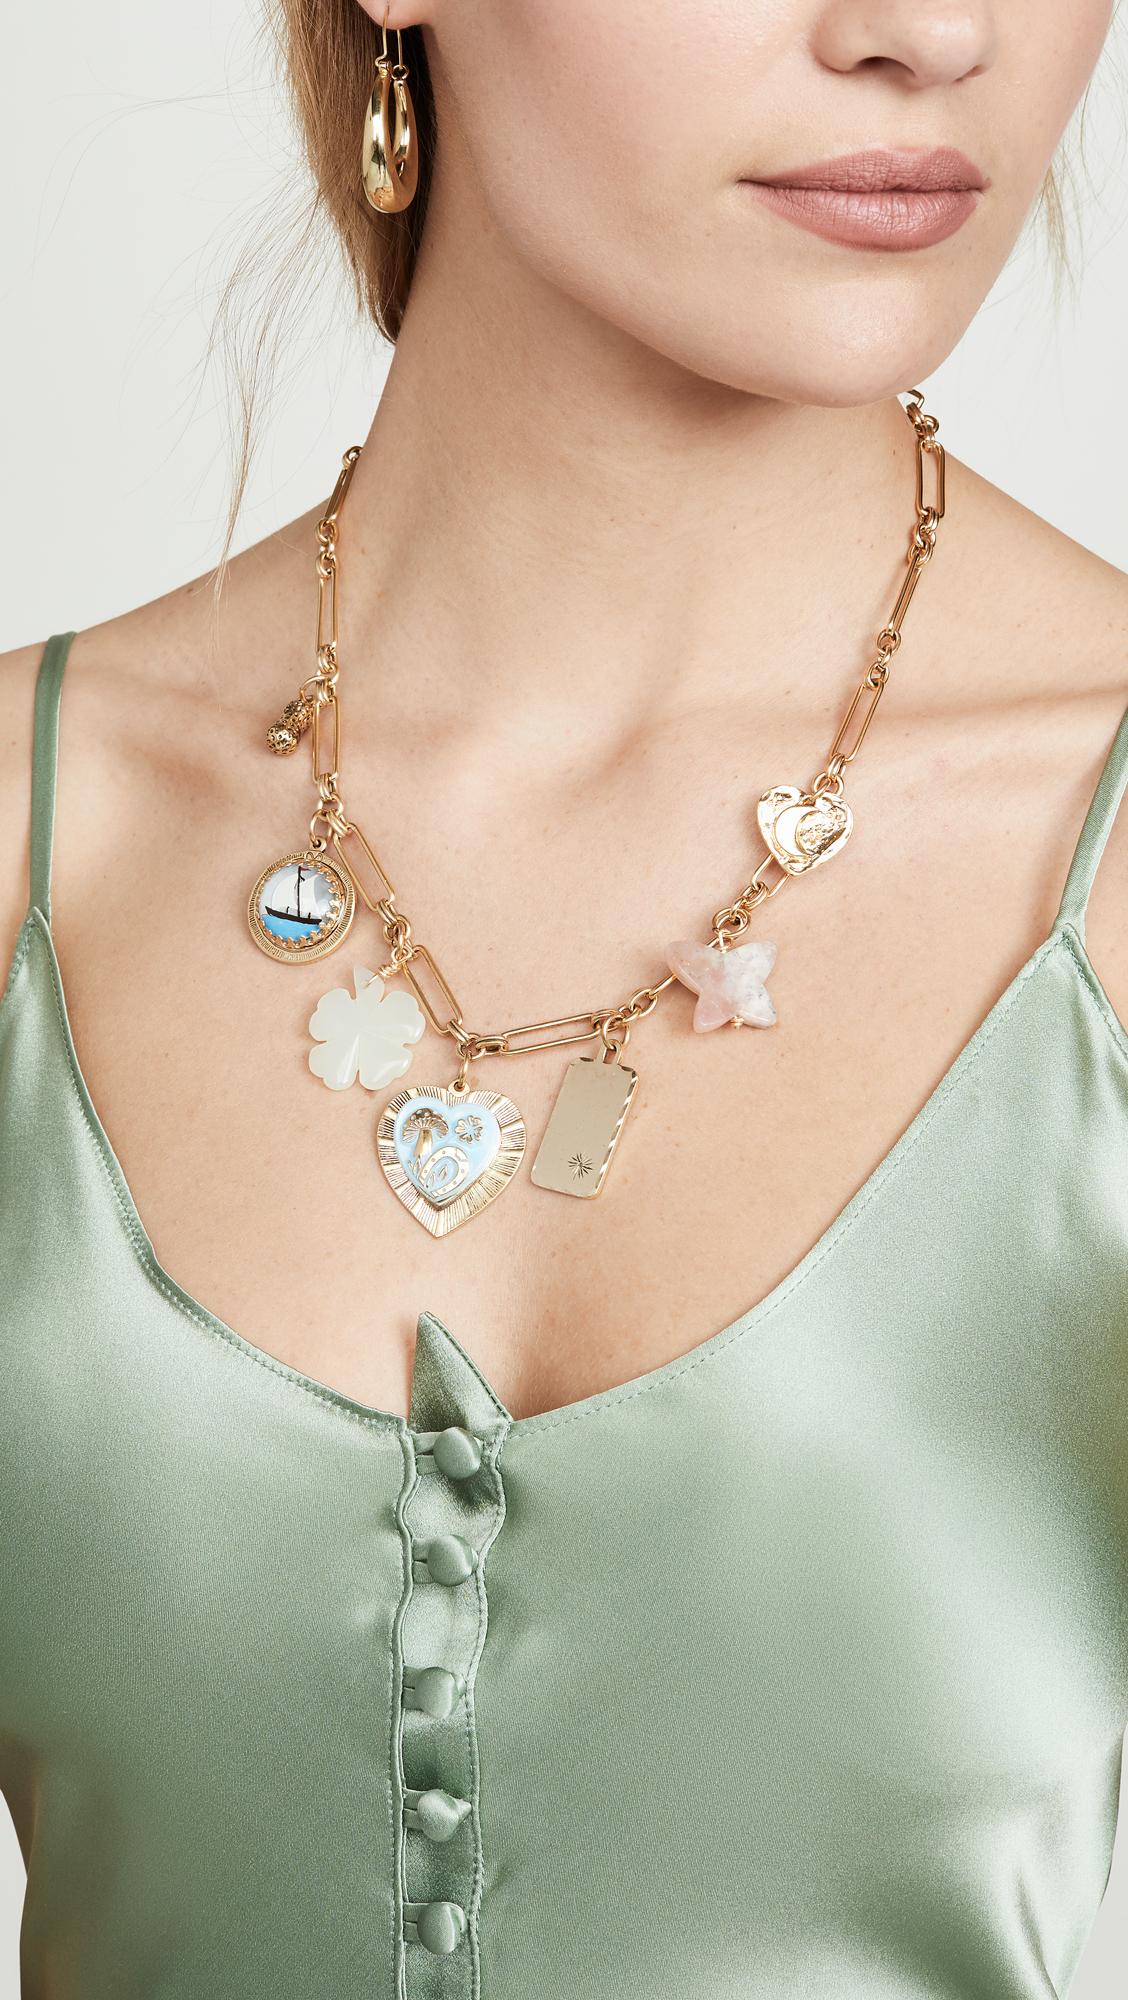 1690fa5752de5b Brinker & Eliza Mischief Managed Charm Necklace | SHOPBOP